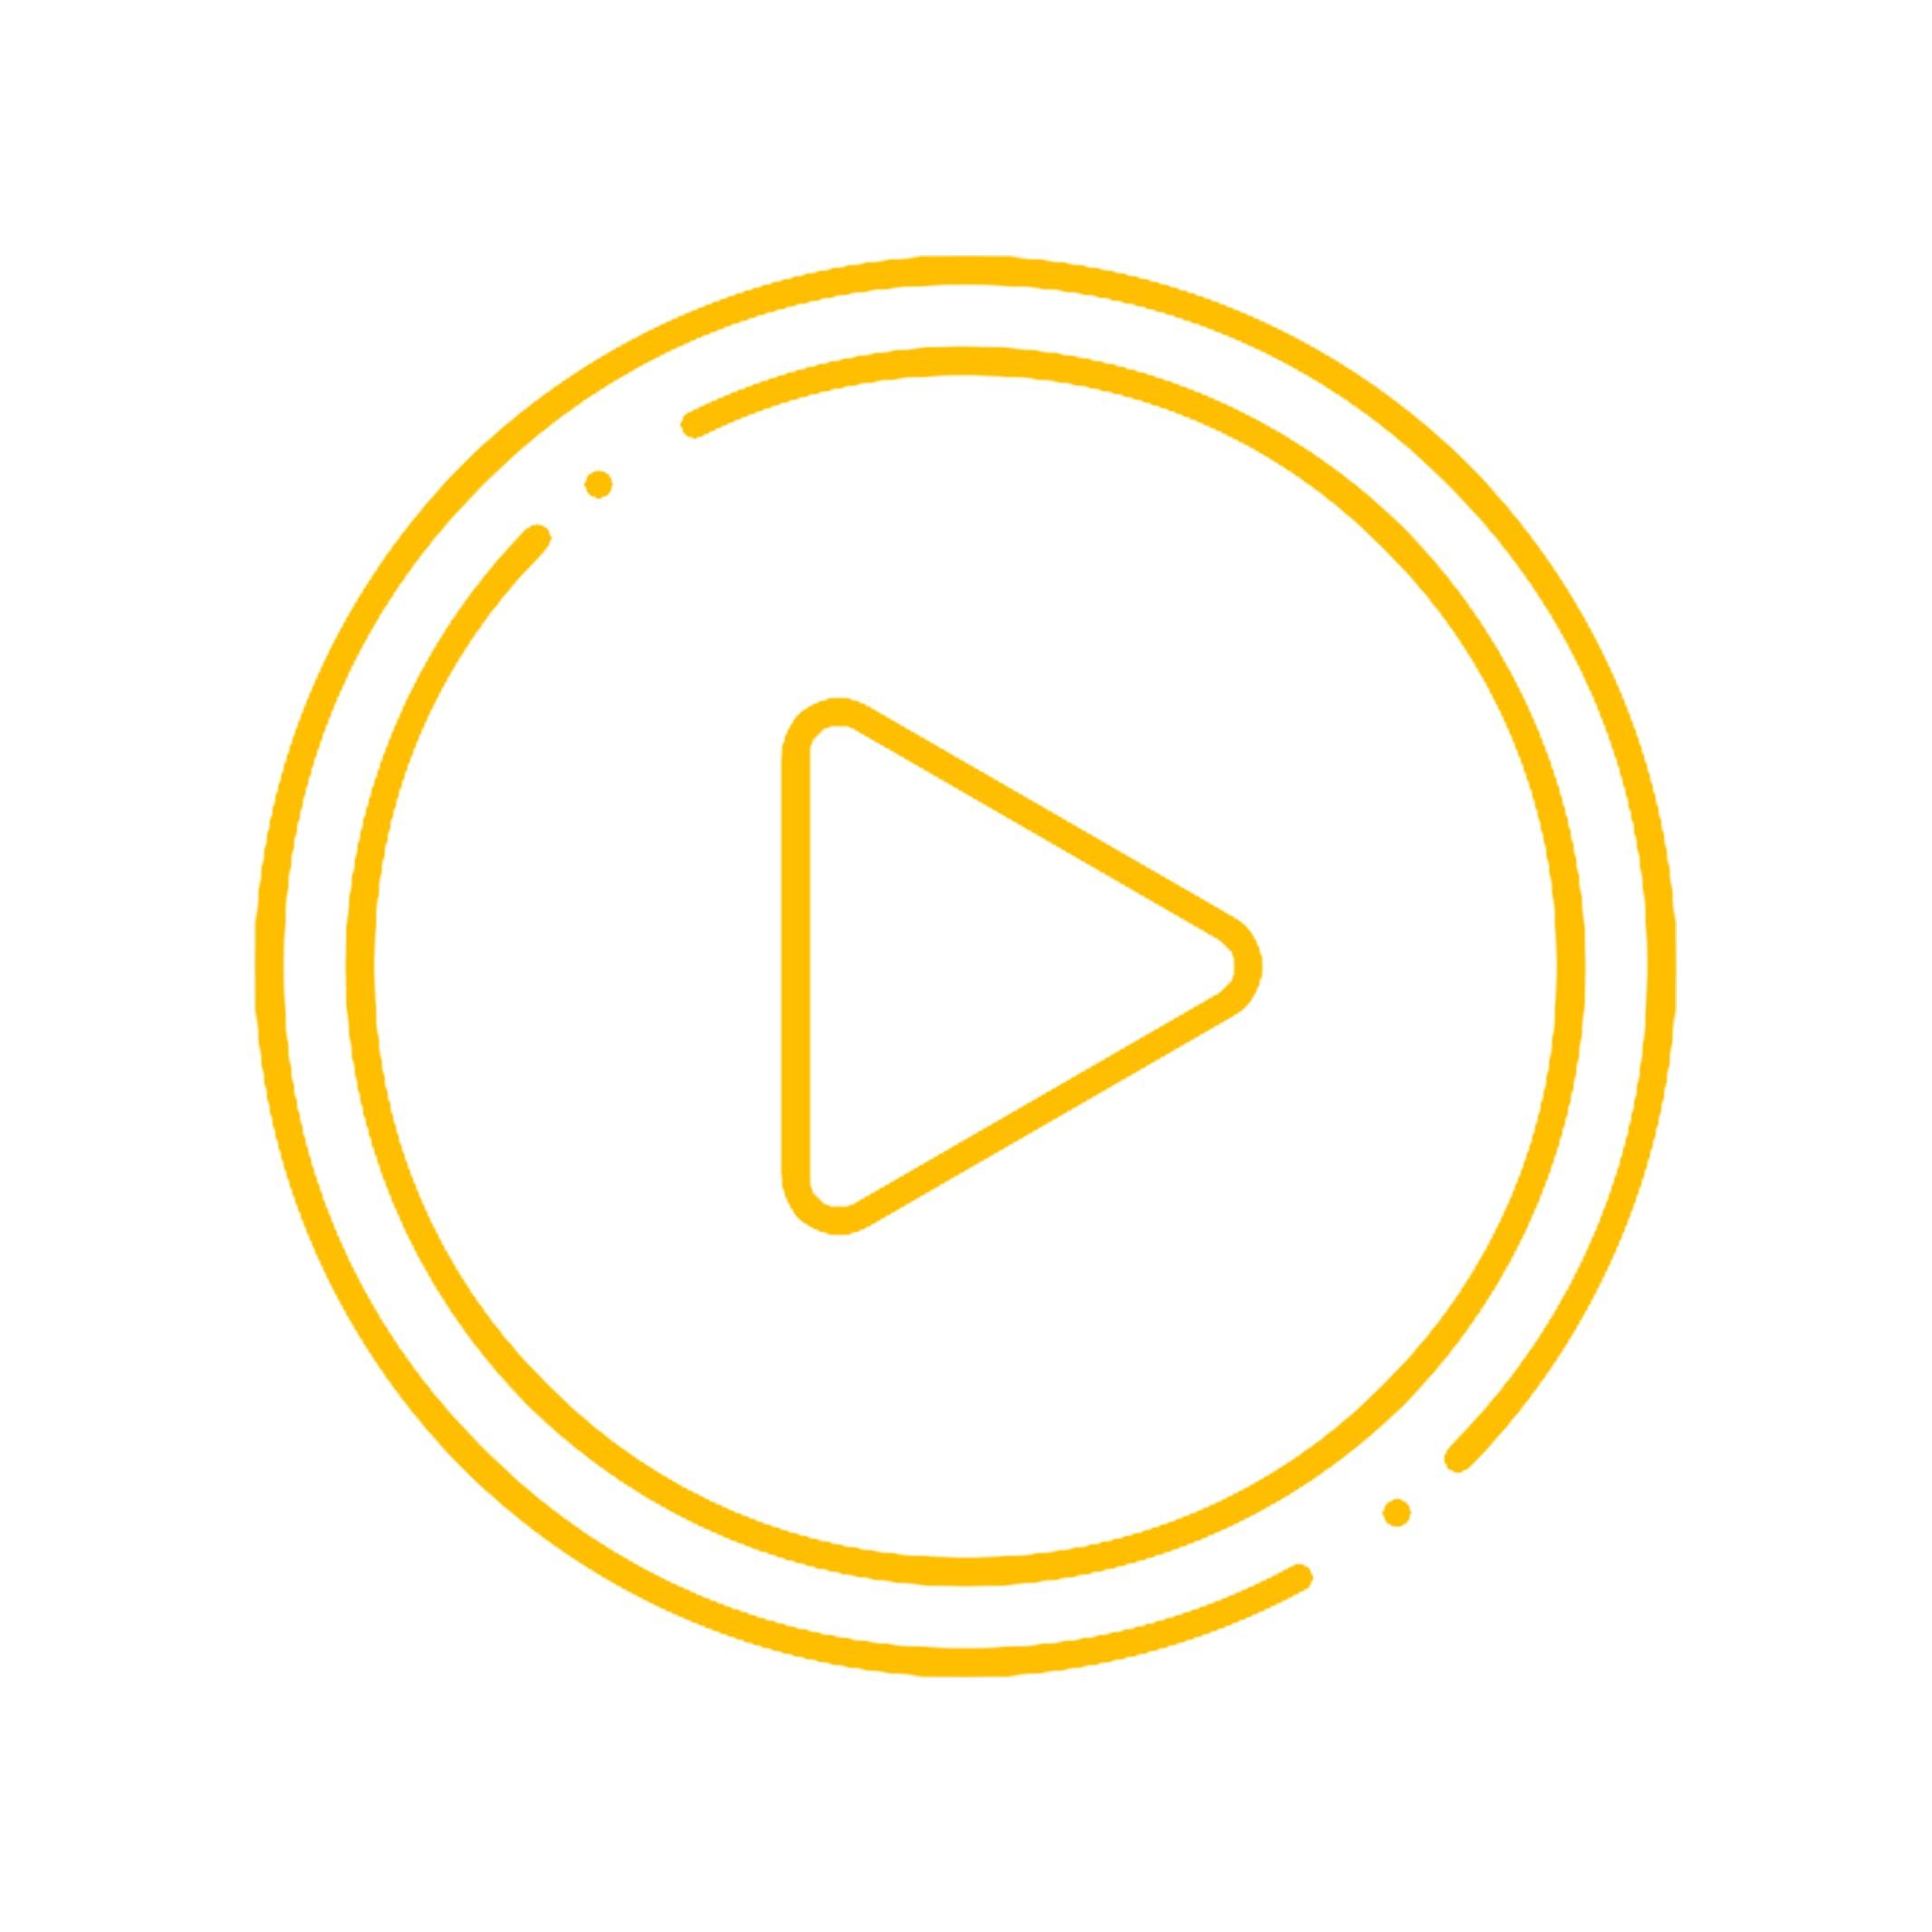 Playbuttonvideo_Icon_03+Kopie.jpg